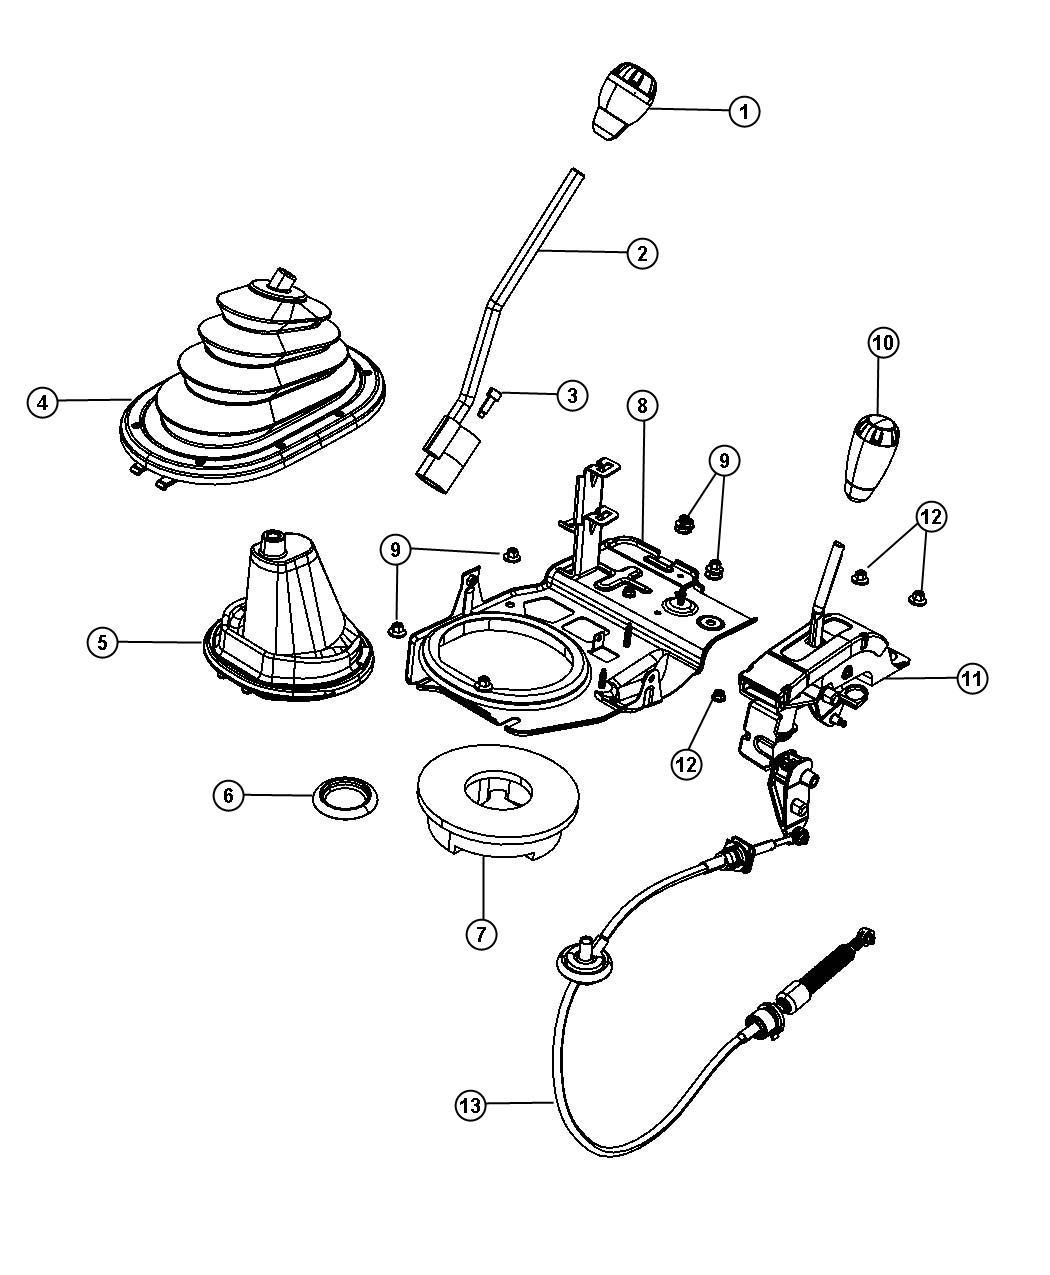 Jeep Wrangler Knob. Gearshift, manual gear shift. Control